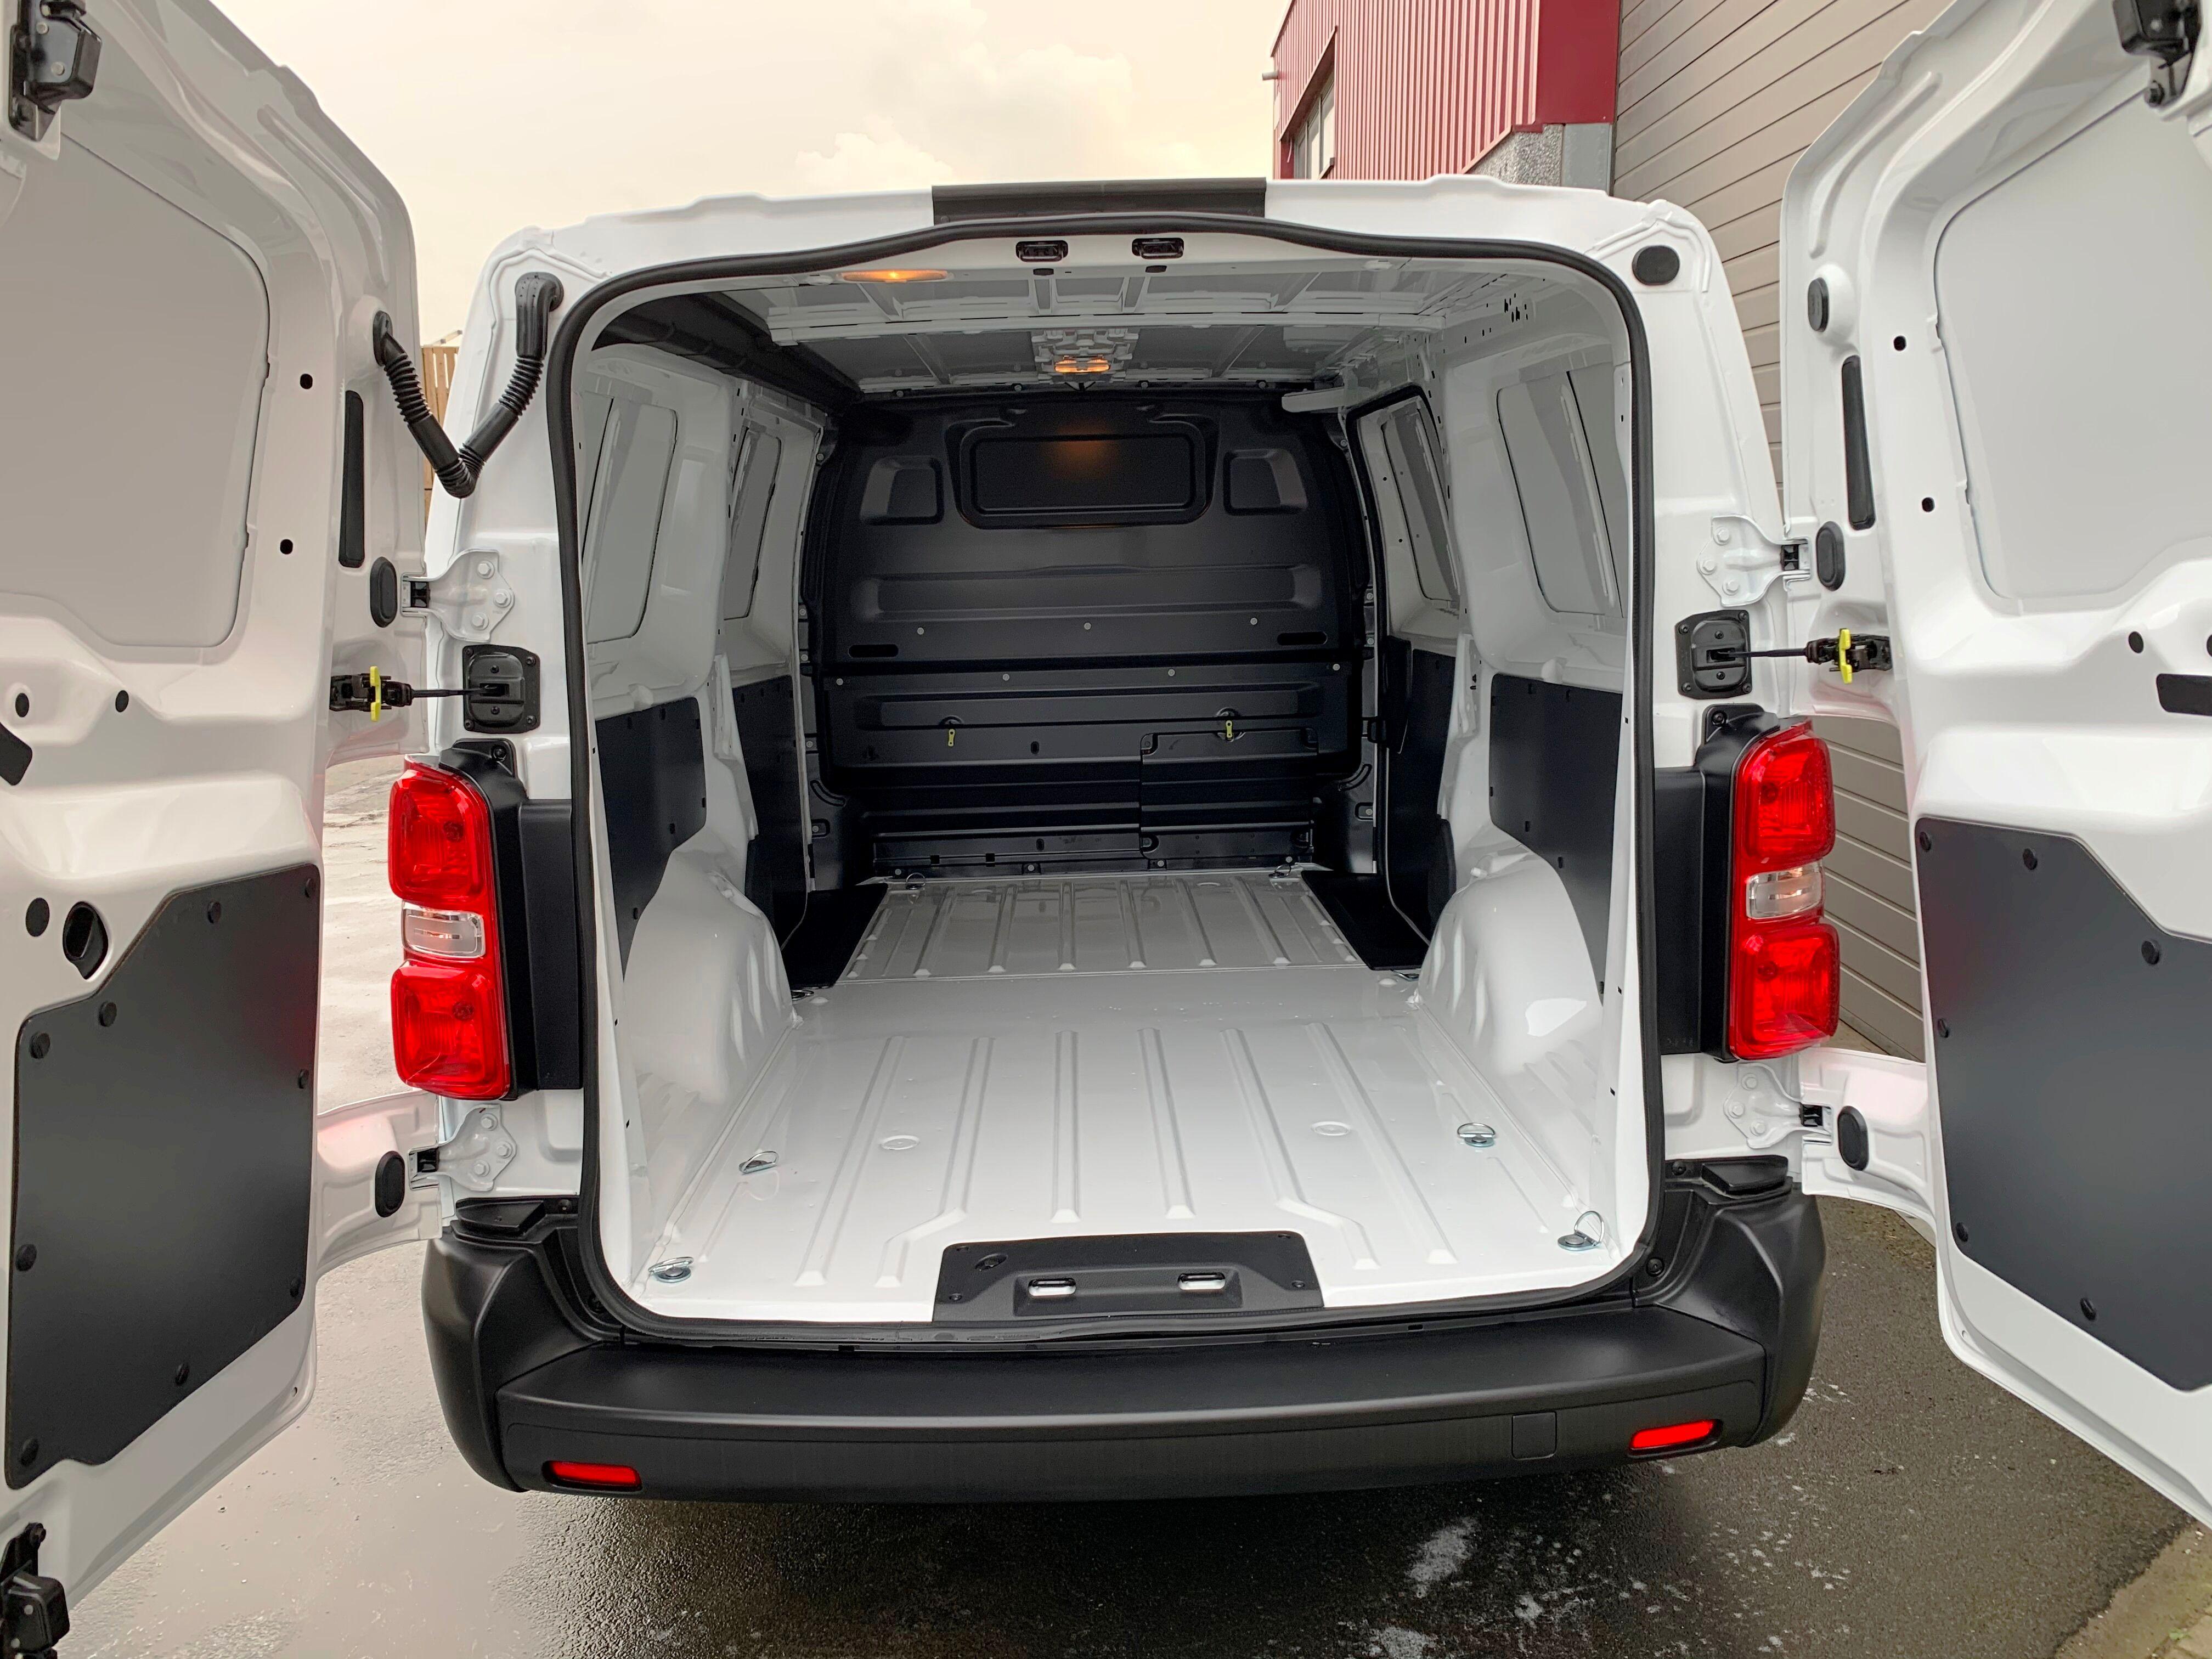 Opel Vivaro 2.0D 122PK Edition L3H1 NIEUW in stock 35% korting 29/29